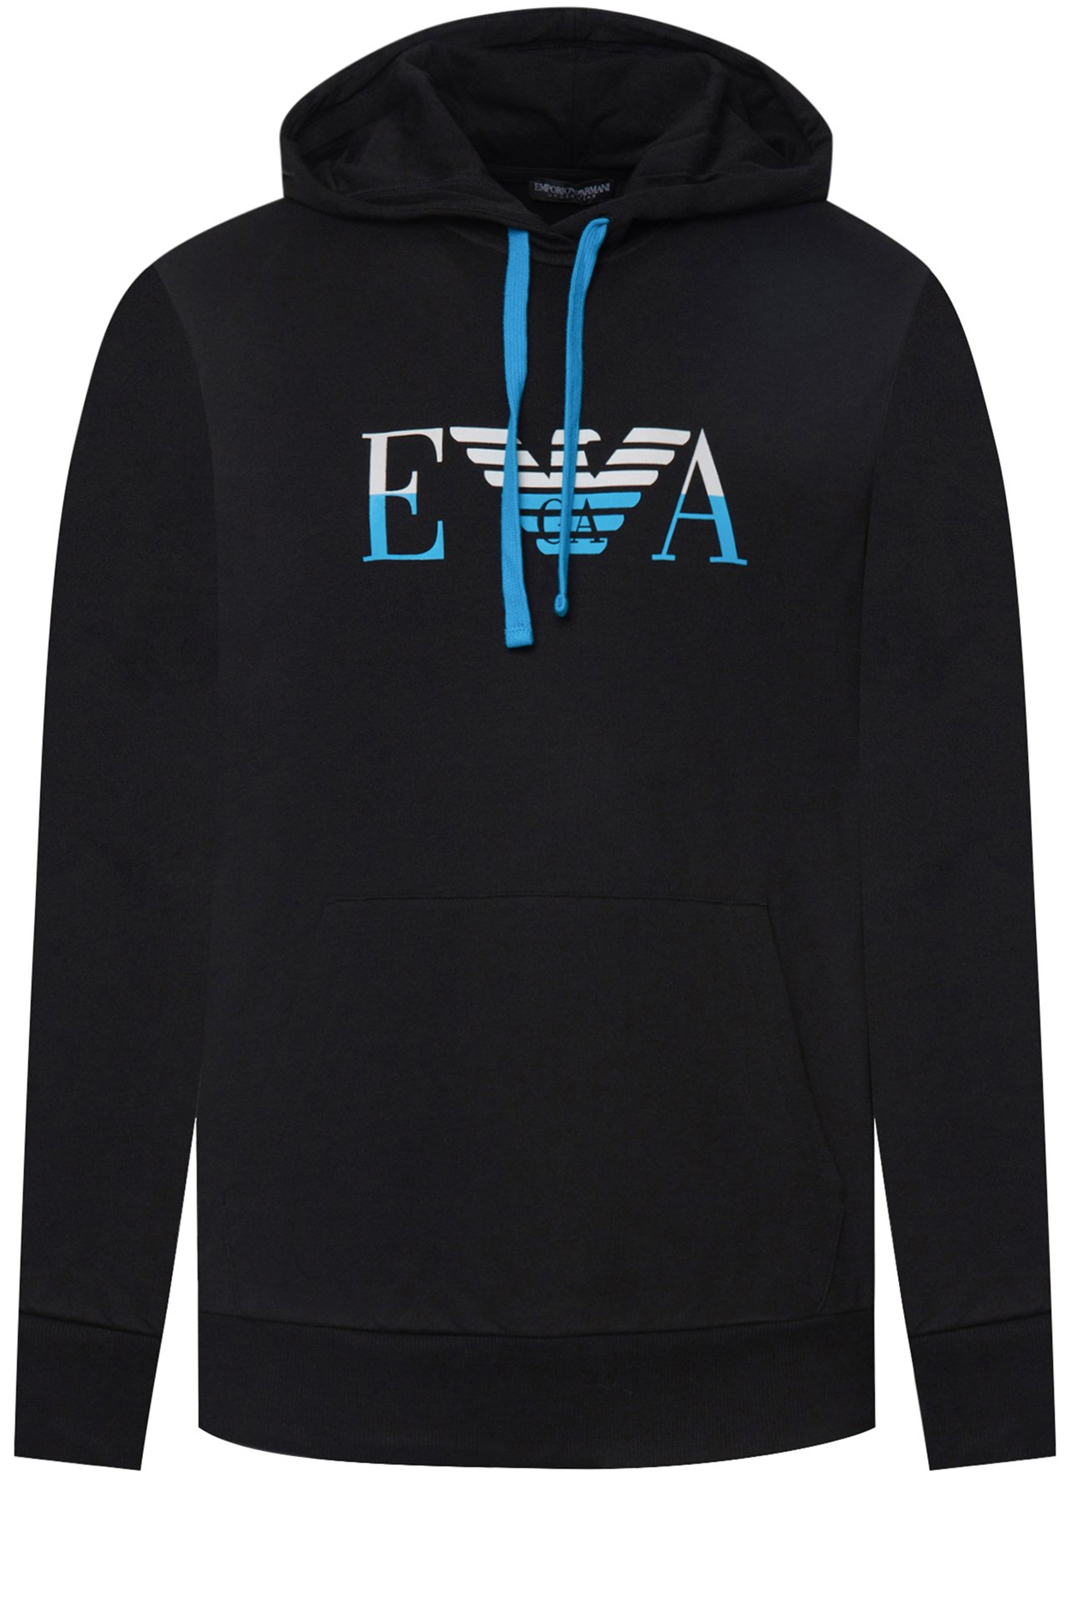 Sweatshirts  Emporio armani 111753 0P571 00020 BLACK